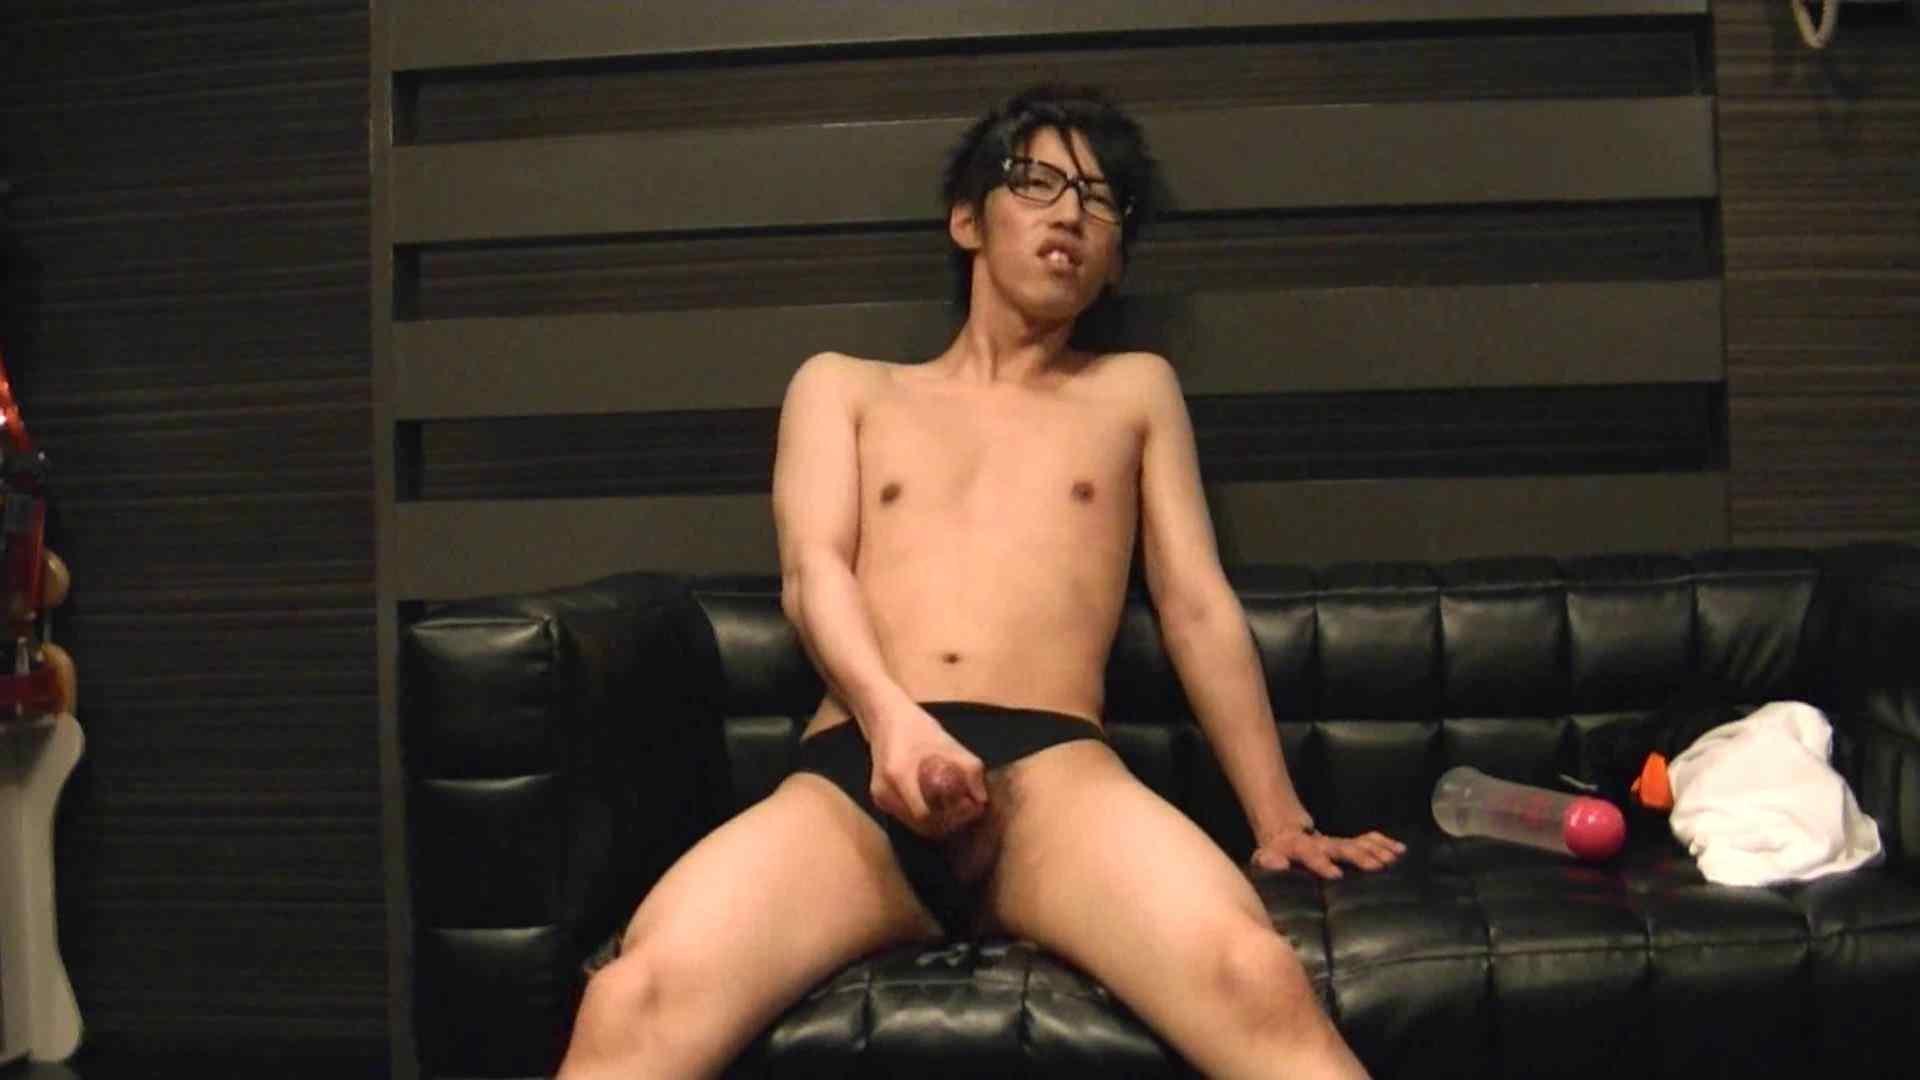 ONA見せカーニバル!! Vol3 男  93pic 16